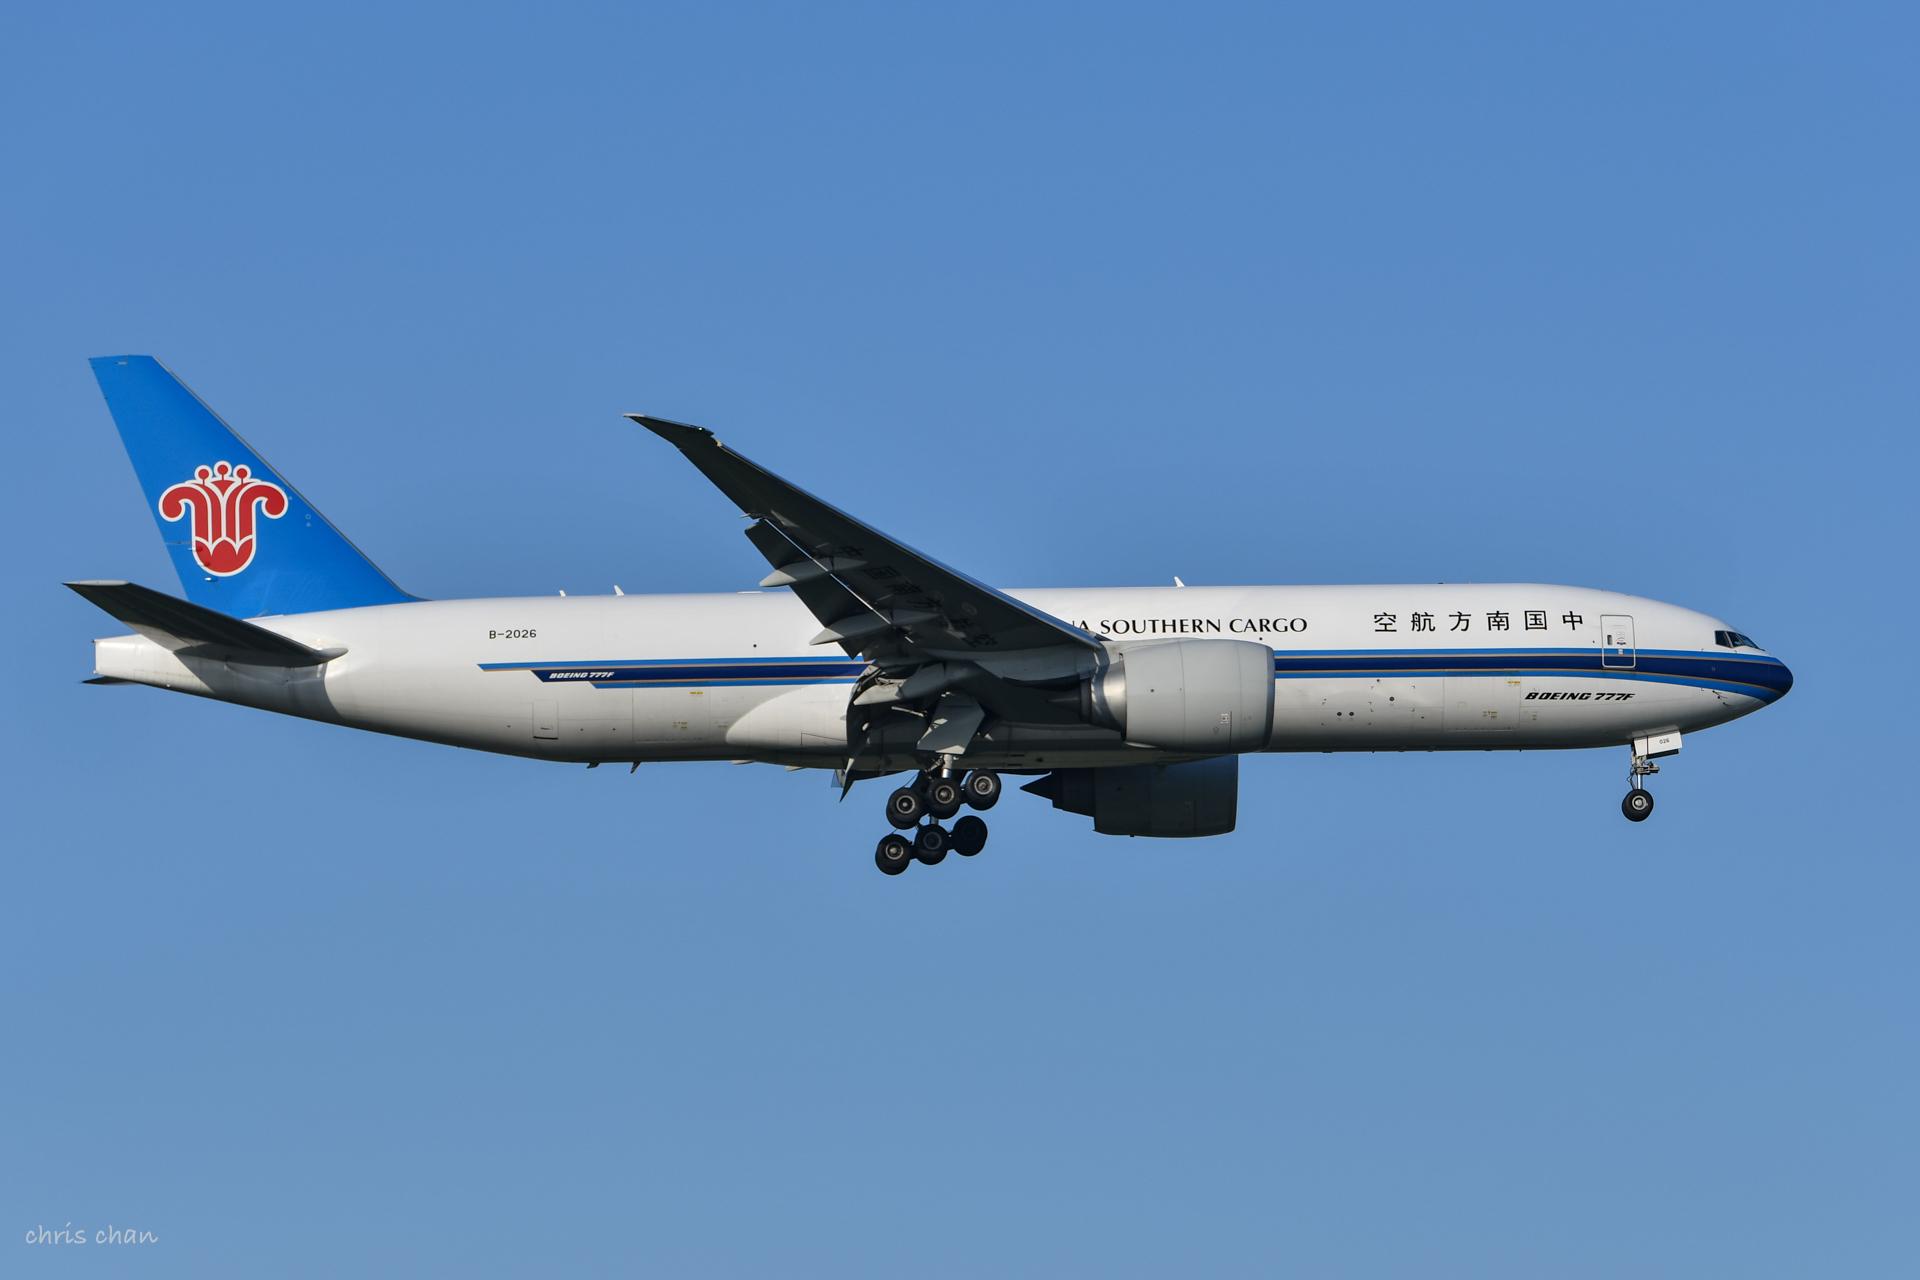 Re:[原创]新人报道——PVG首拍 BOEING 777-200 B-2026 中国上海浦东国际机场